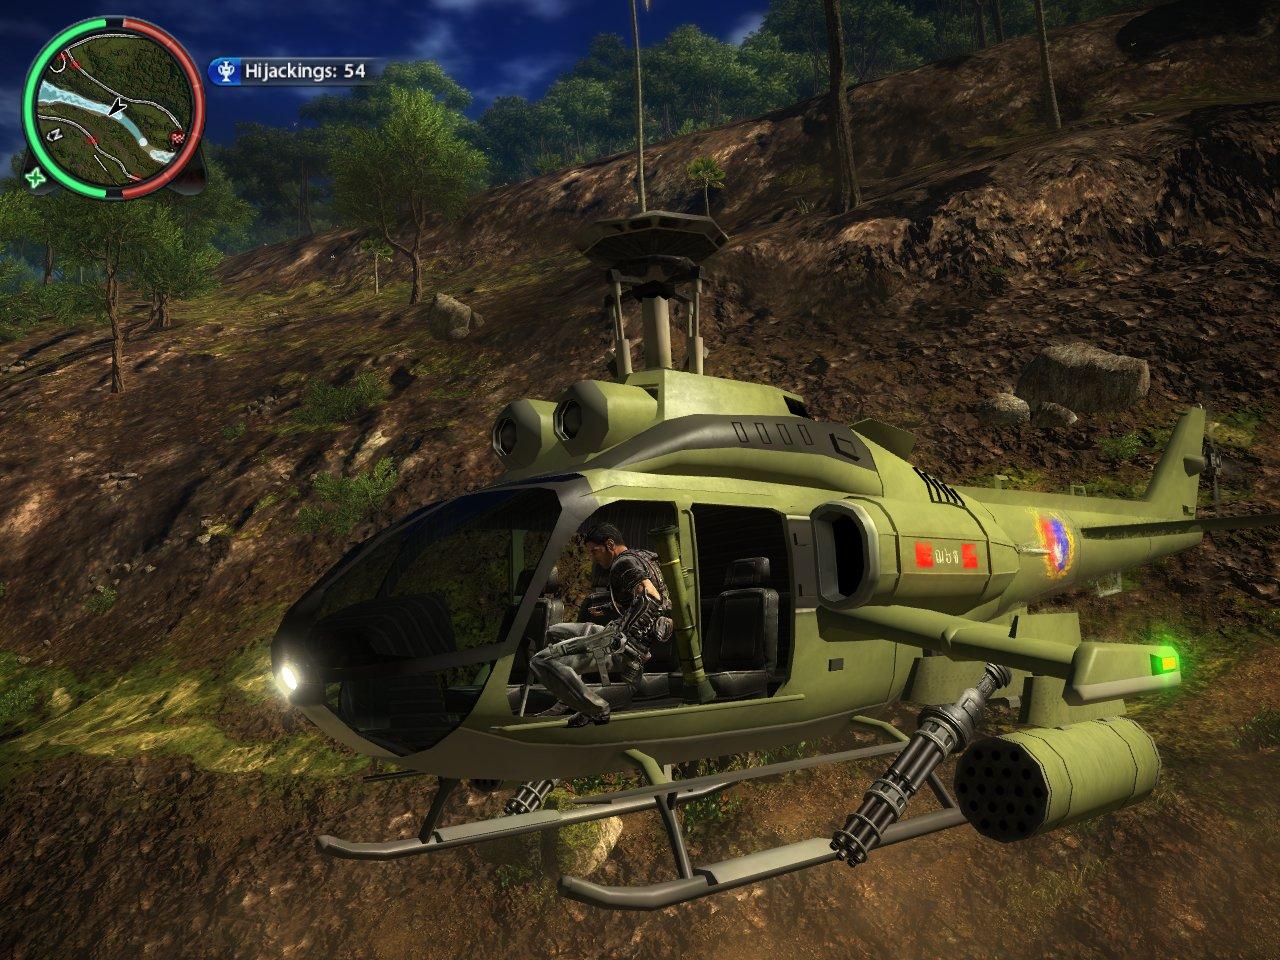 Just Cause 3 Elicottero Per Reportage : Gamesark recensione just cause